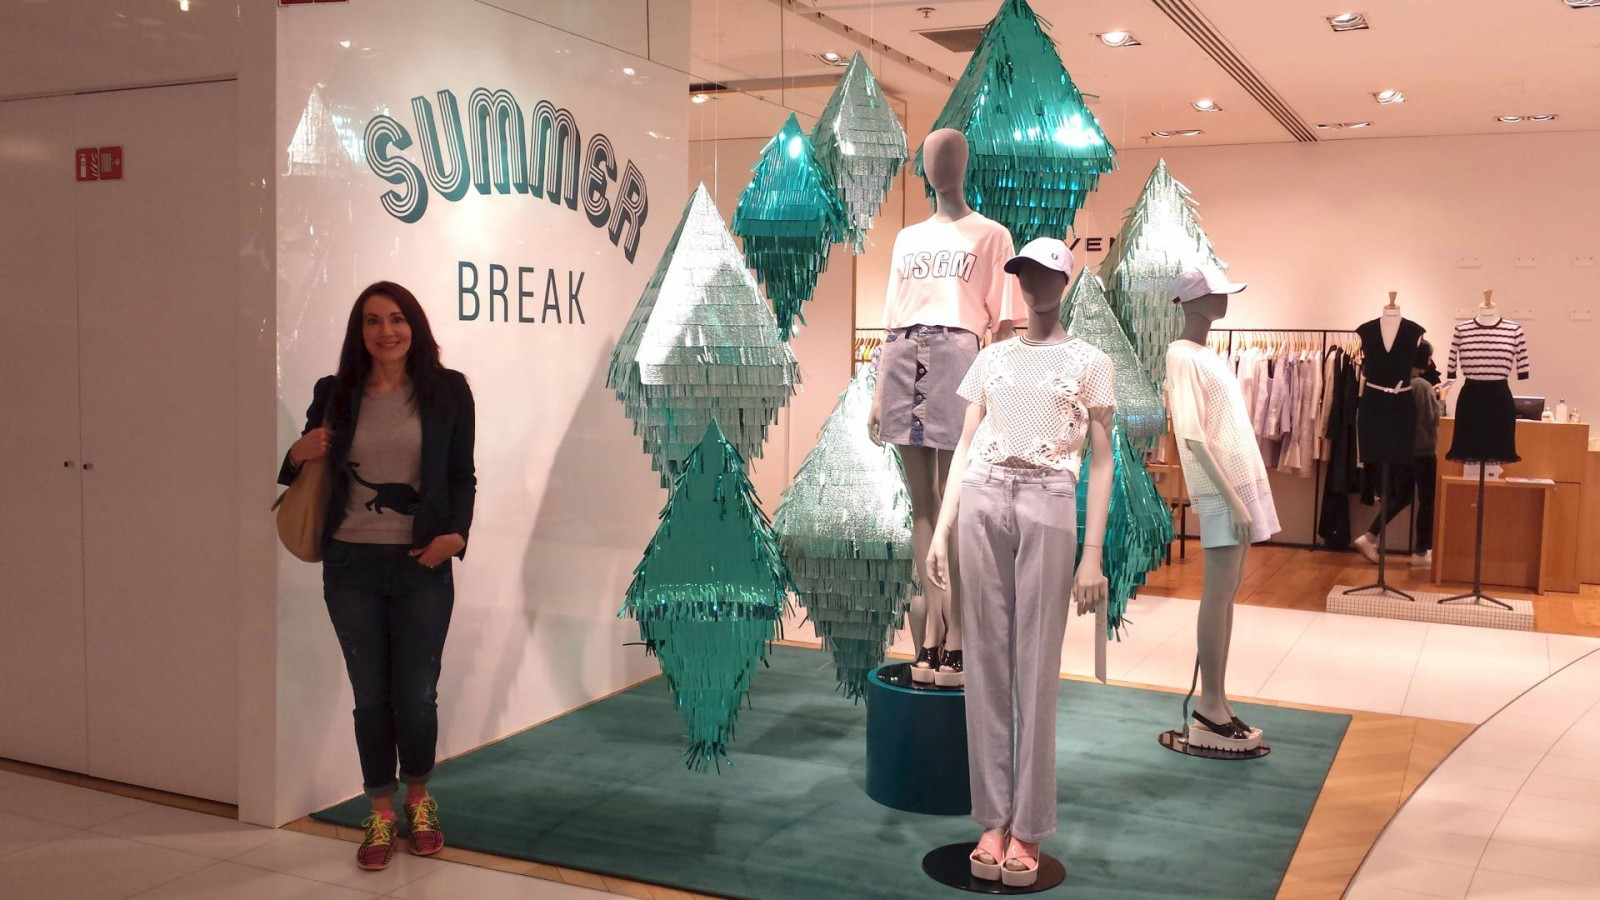 Galeries Lafayette store display, Zara jacket Gap jeans